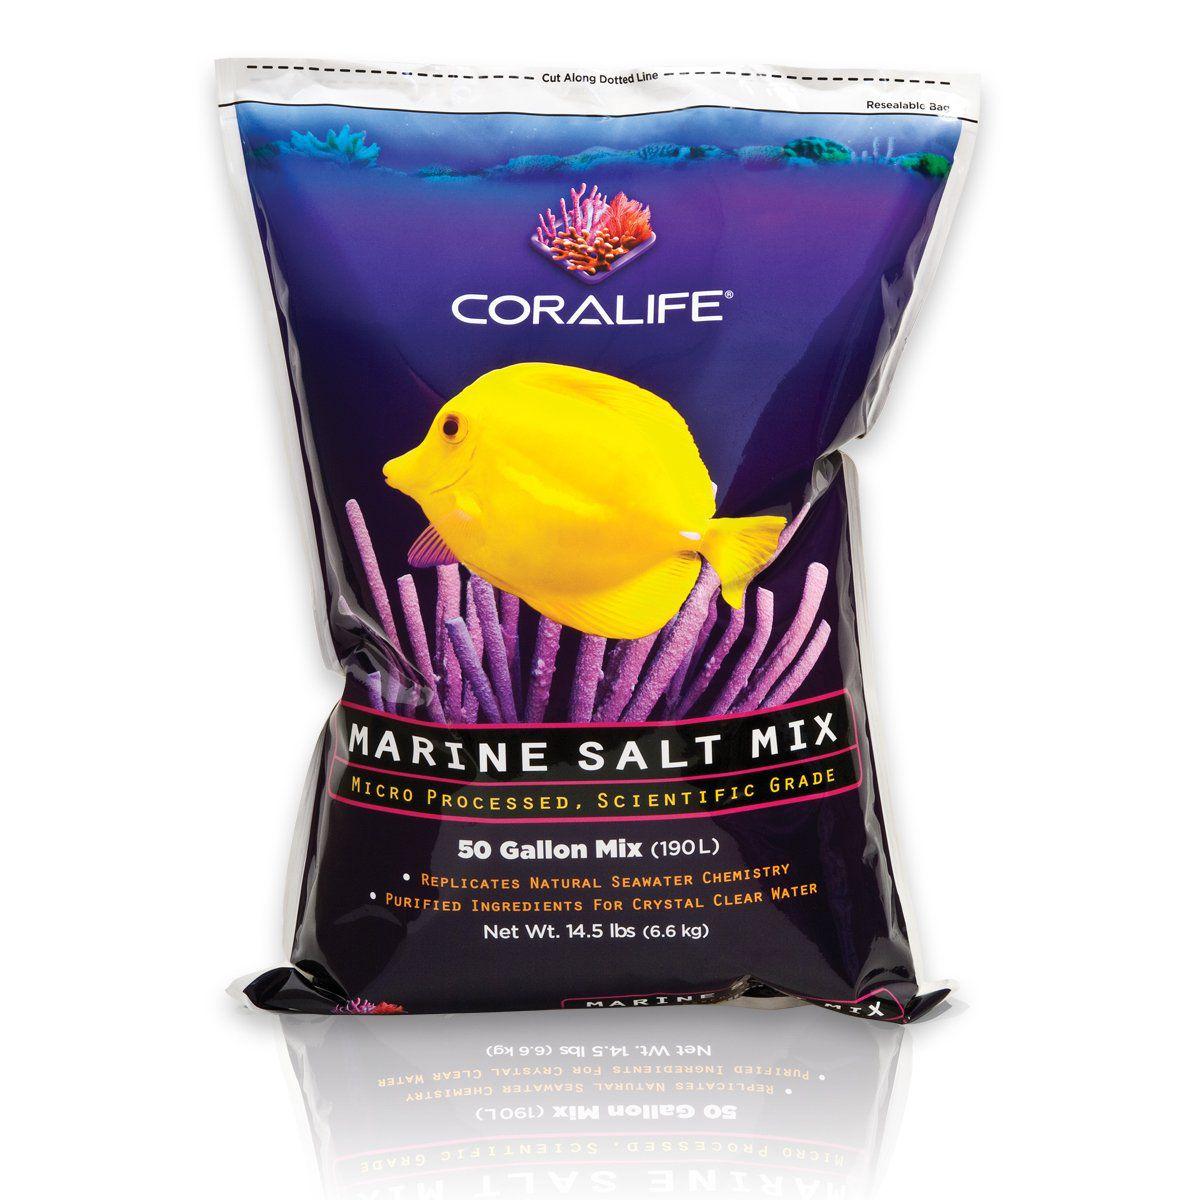 Coralife Sea Salt Mix